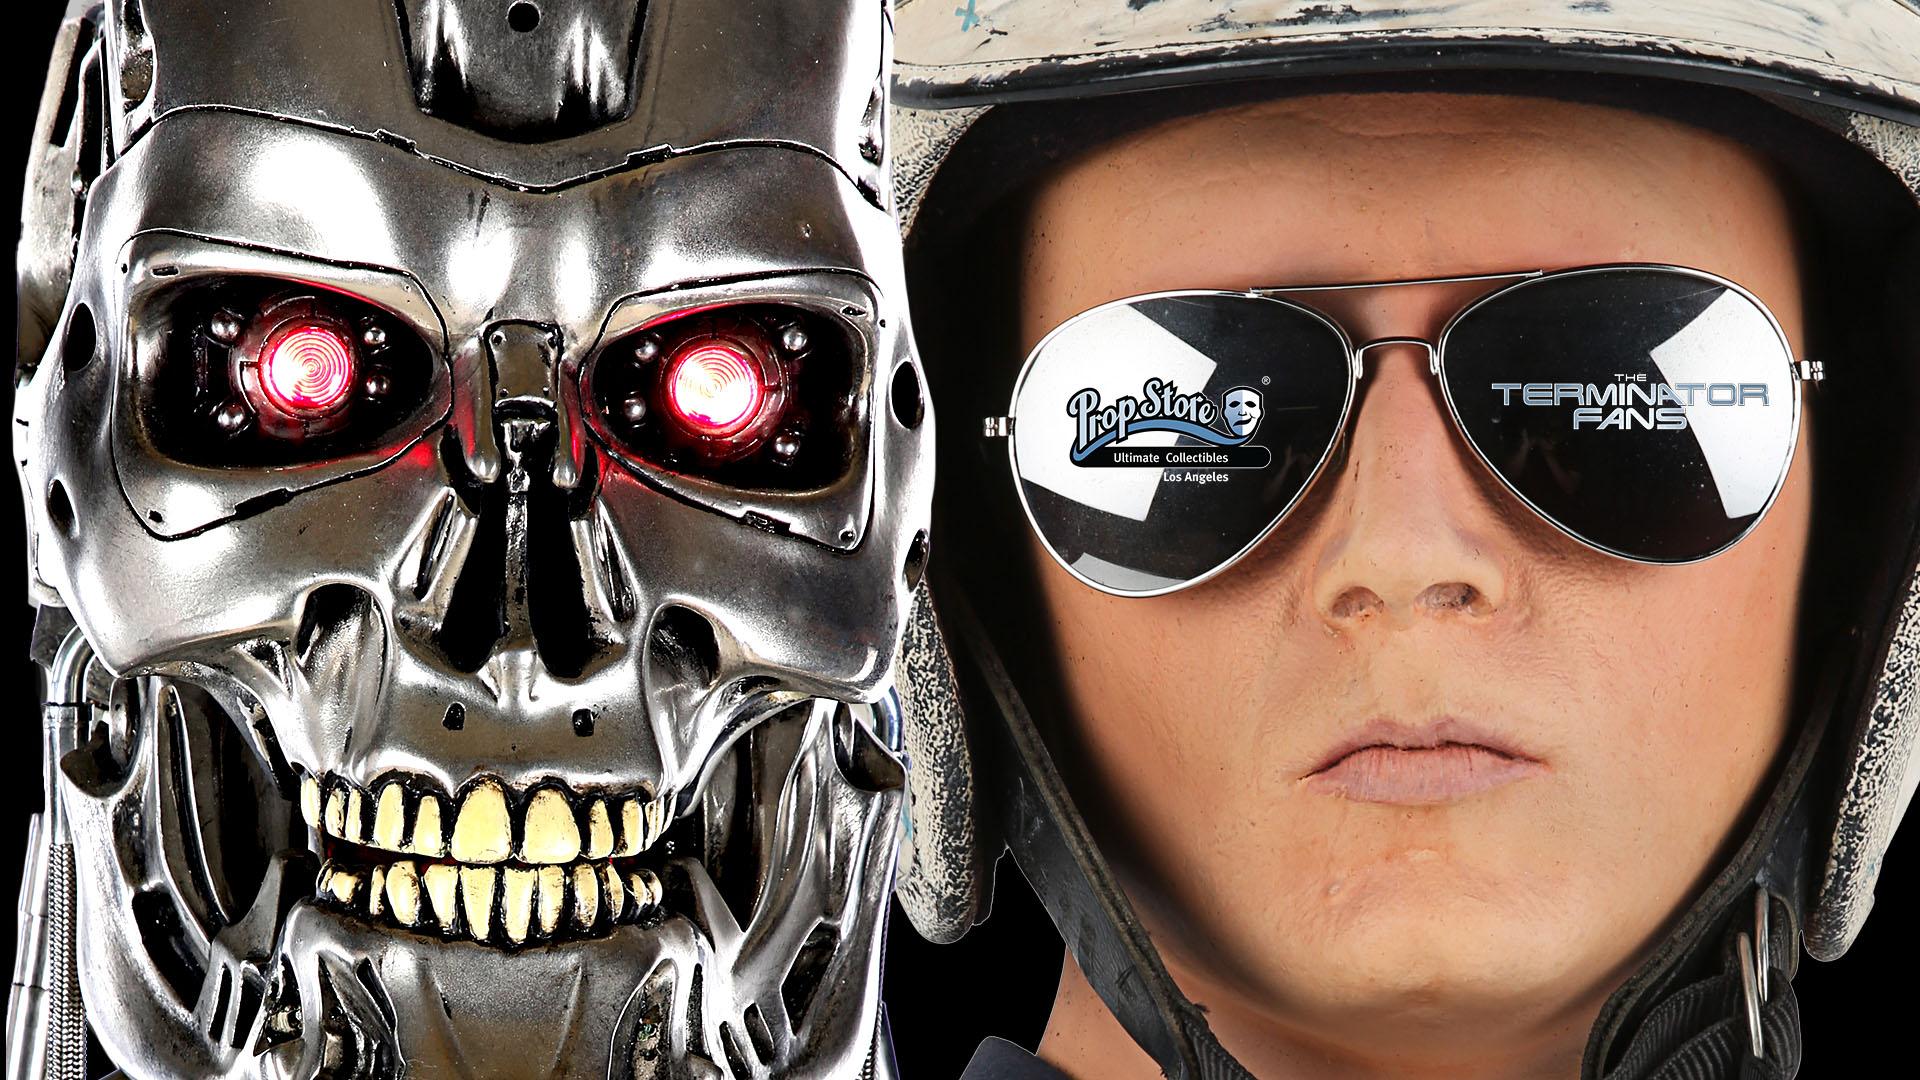 Prop Store Entertainment Memorabilia Live Auction 2021 Terminator Items